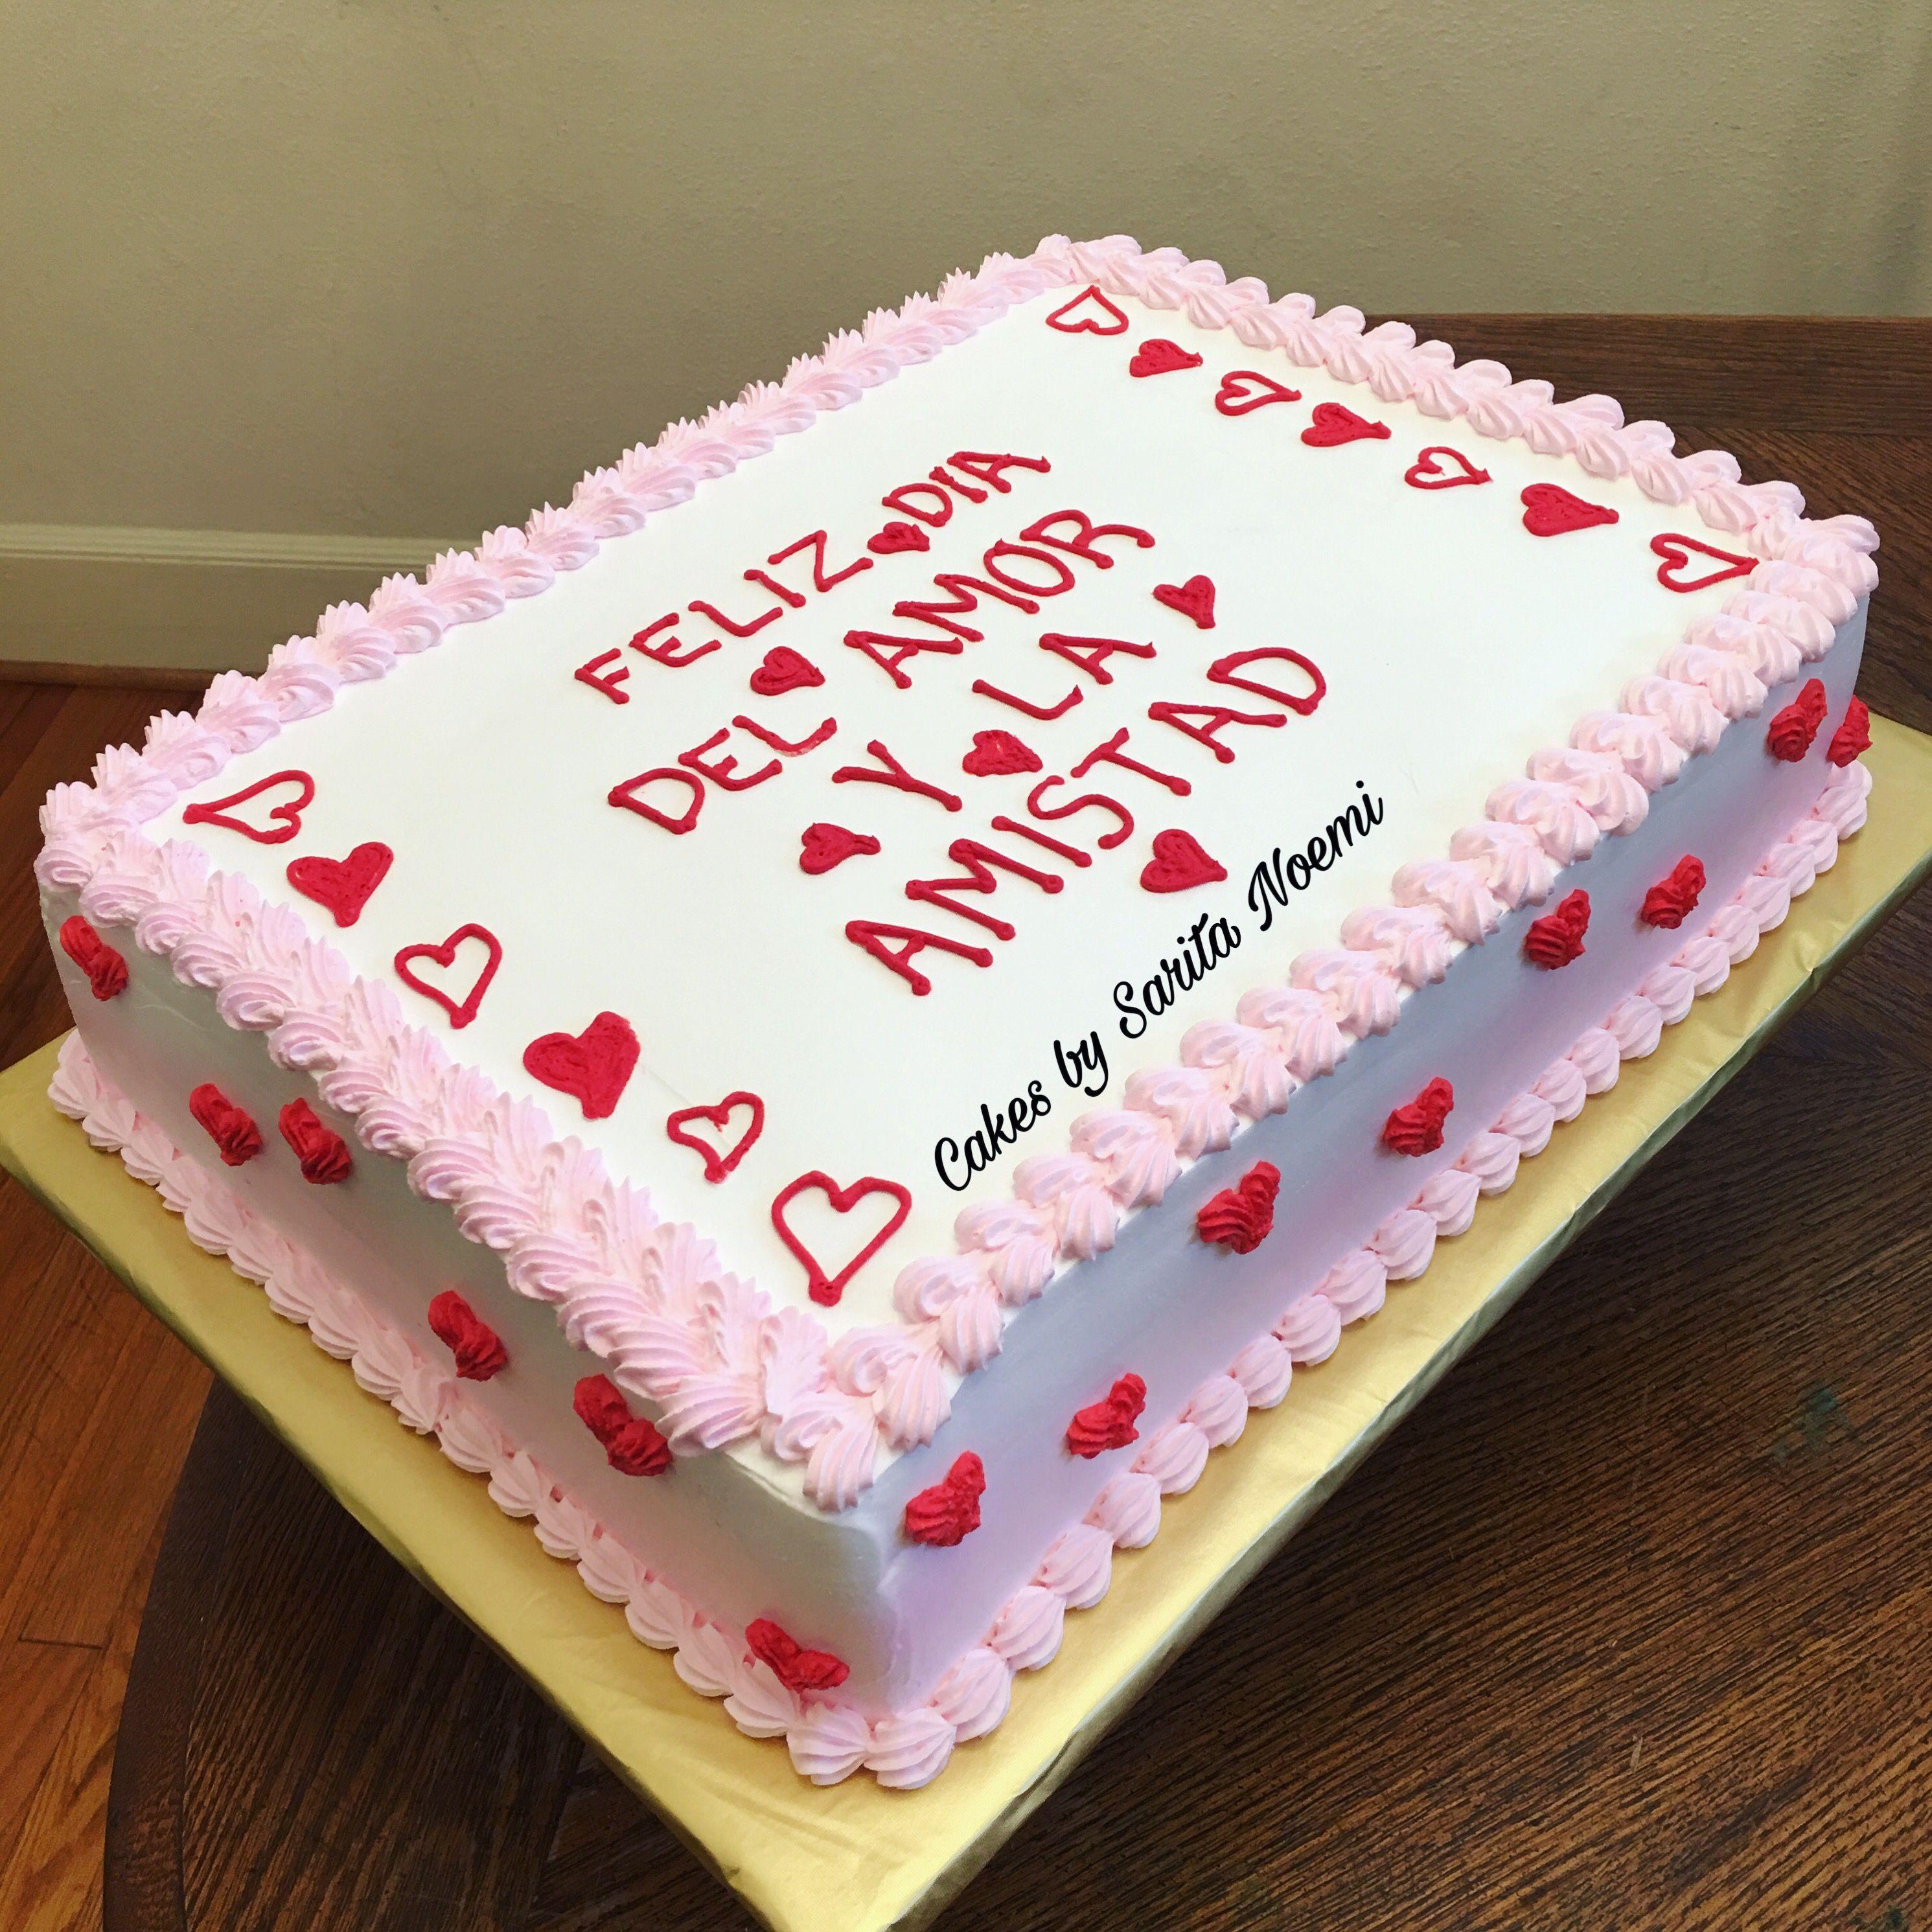 Cake for valentines day cake yummy cakes valentine cake